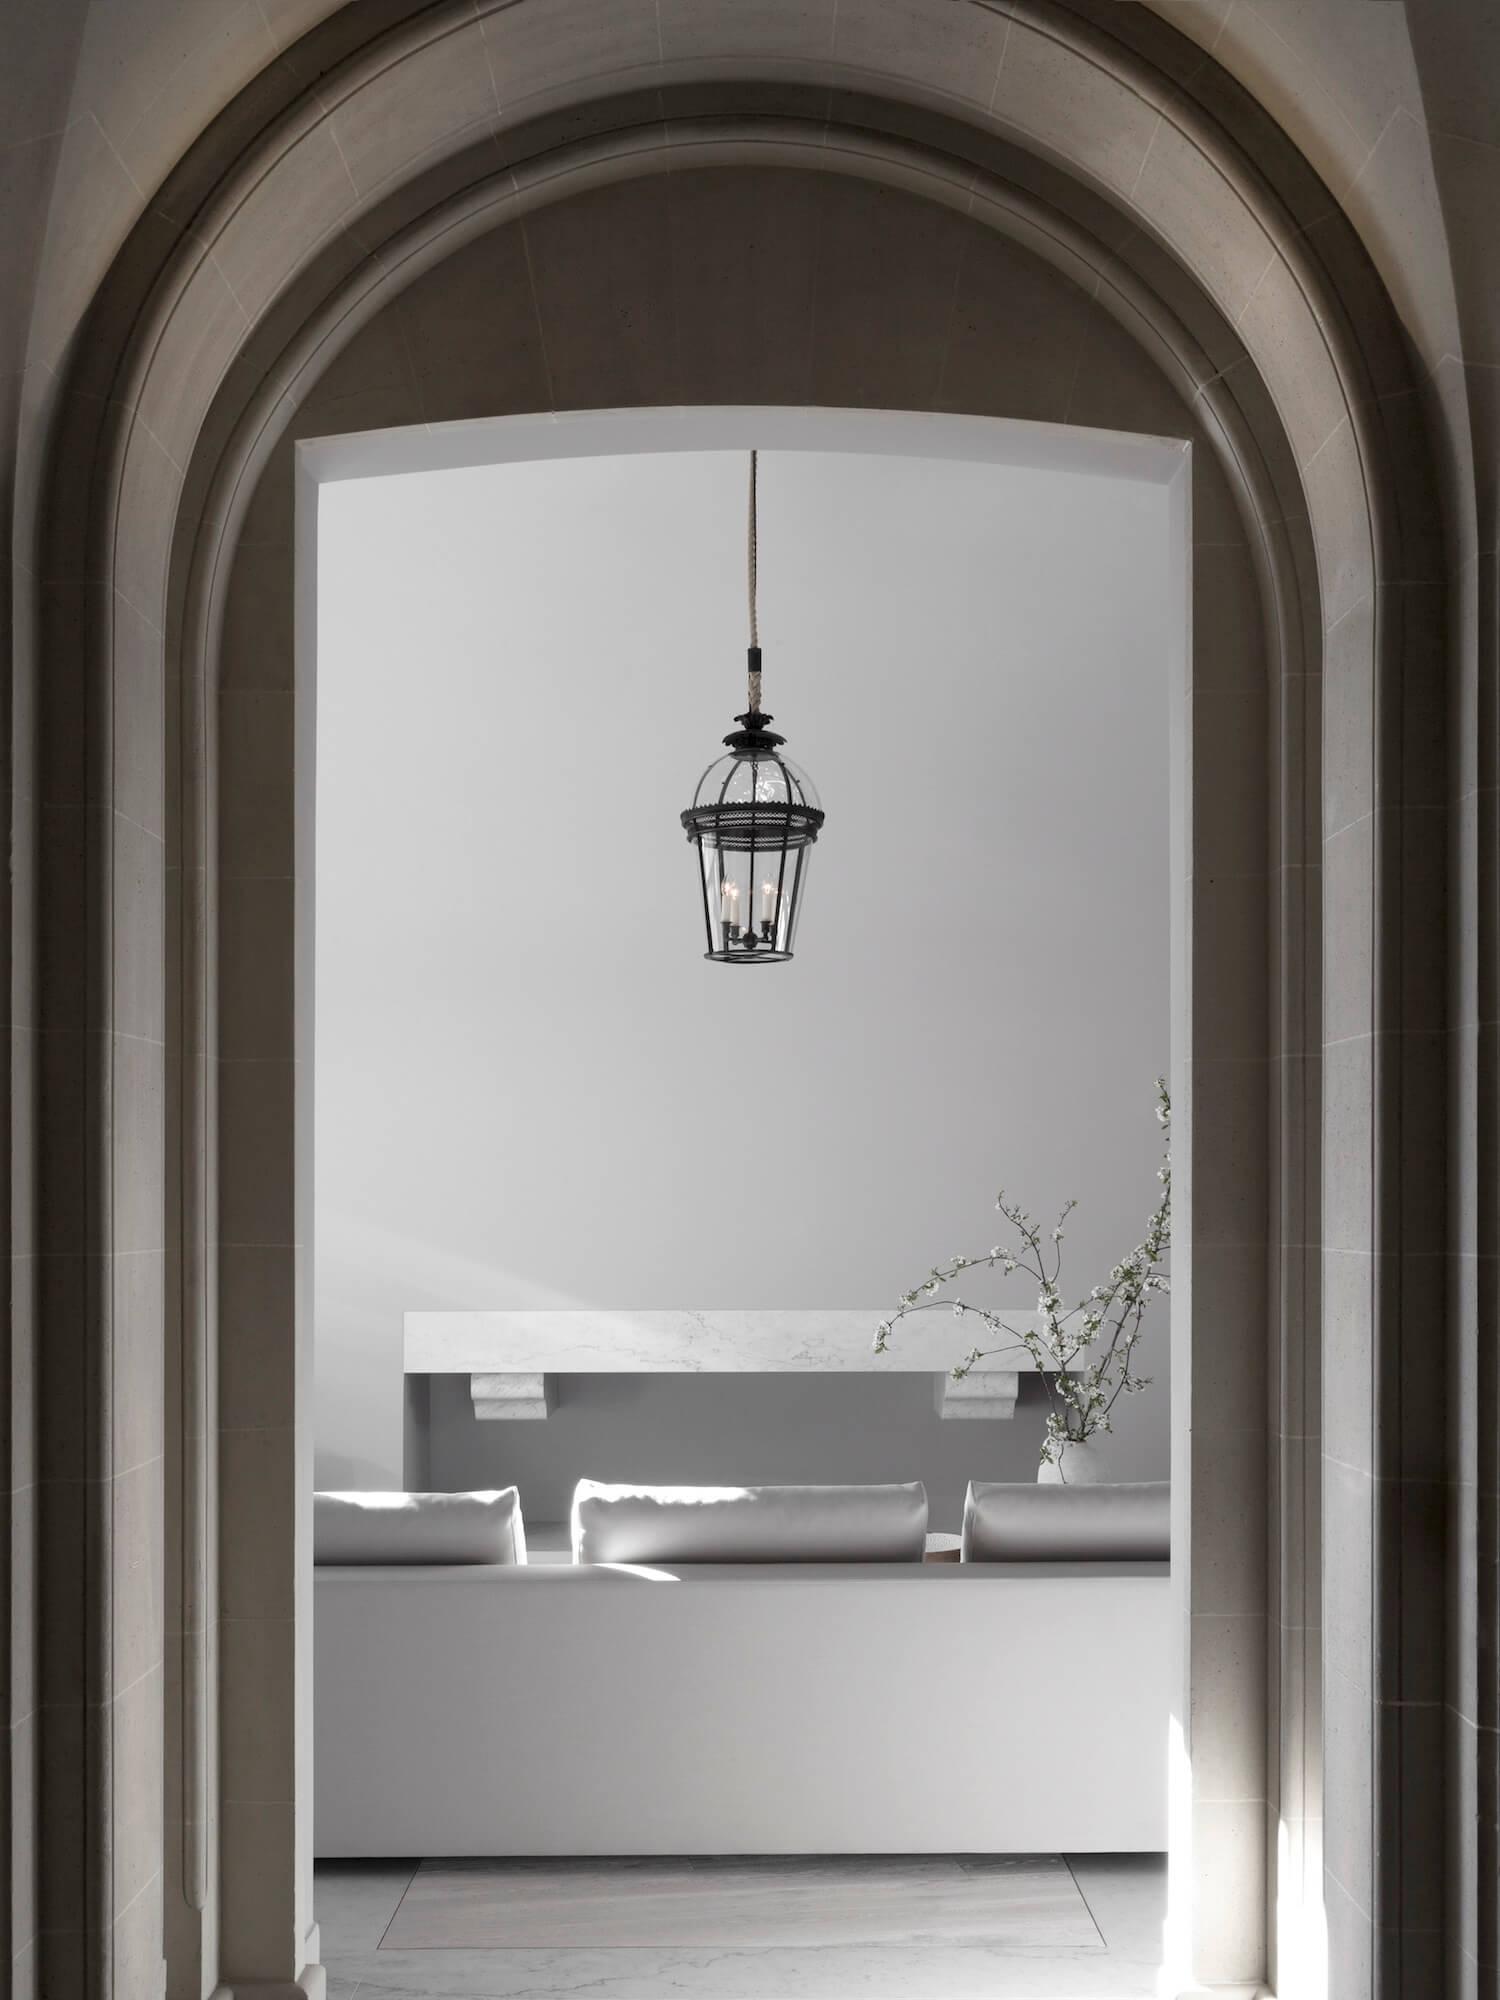 phong cách tối giản elledecoration vietnam-paris-apartment-guillaume-alan4